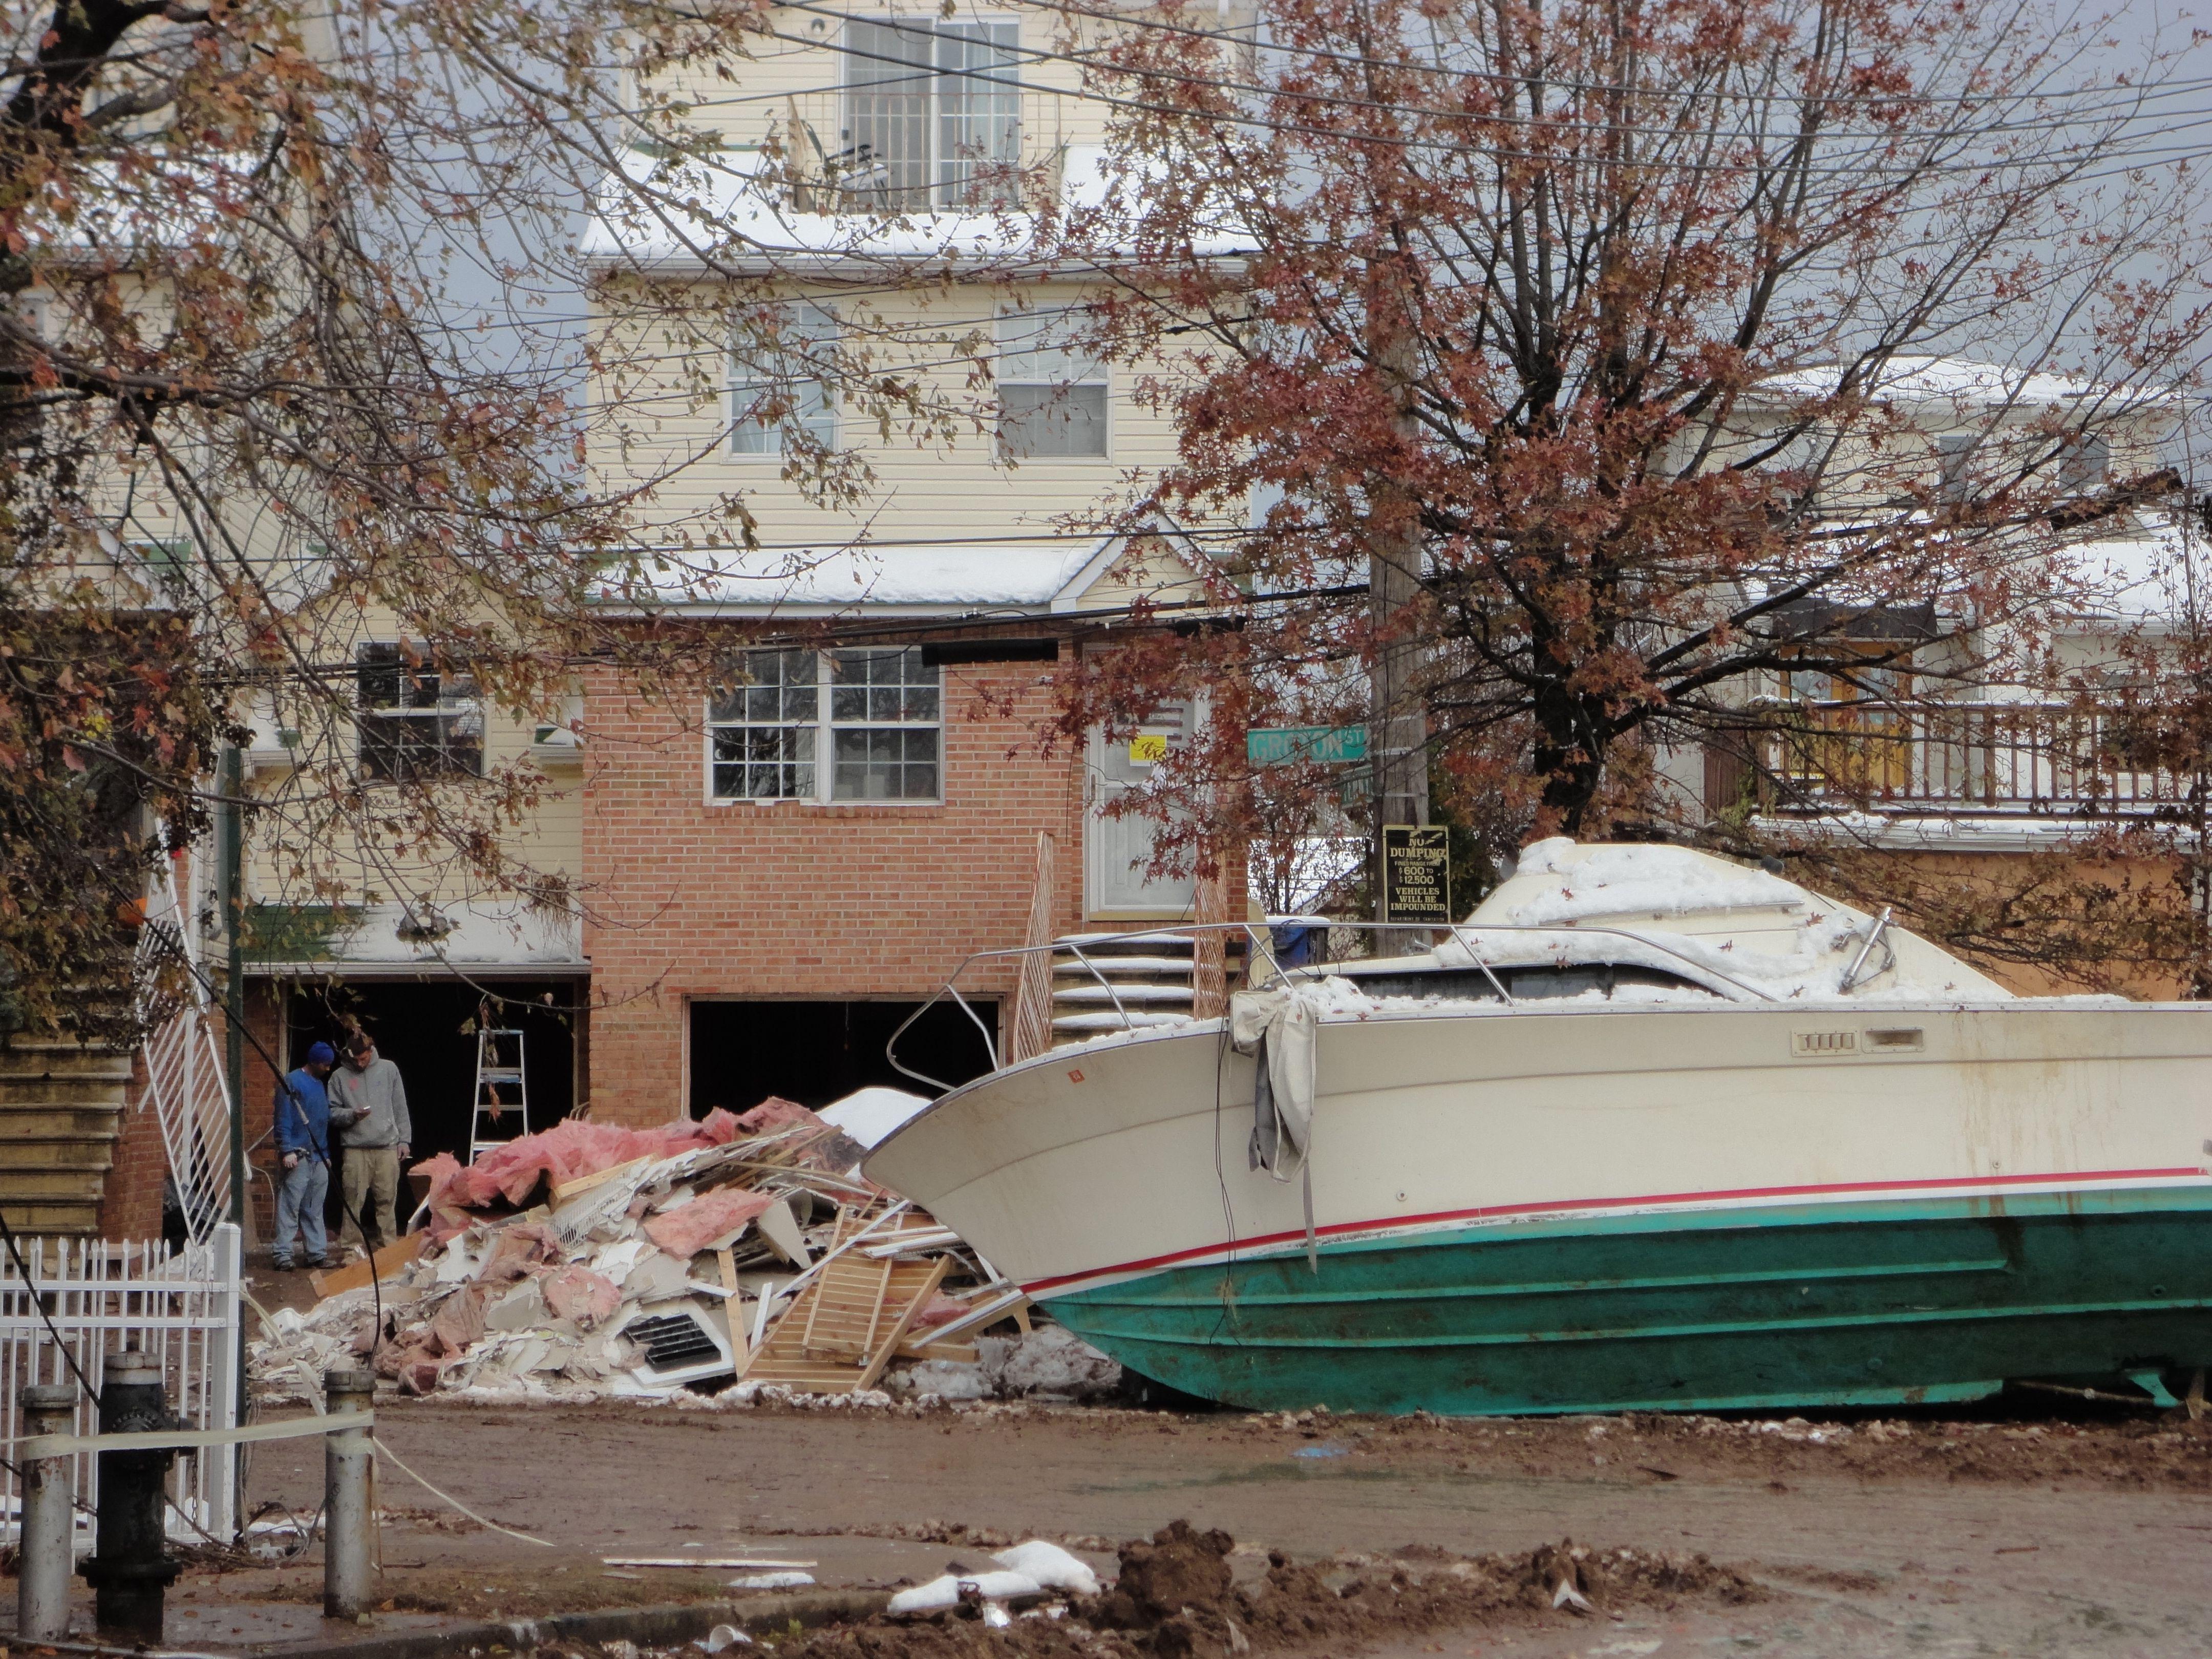 BoatUS hurricane resources